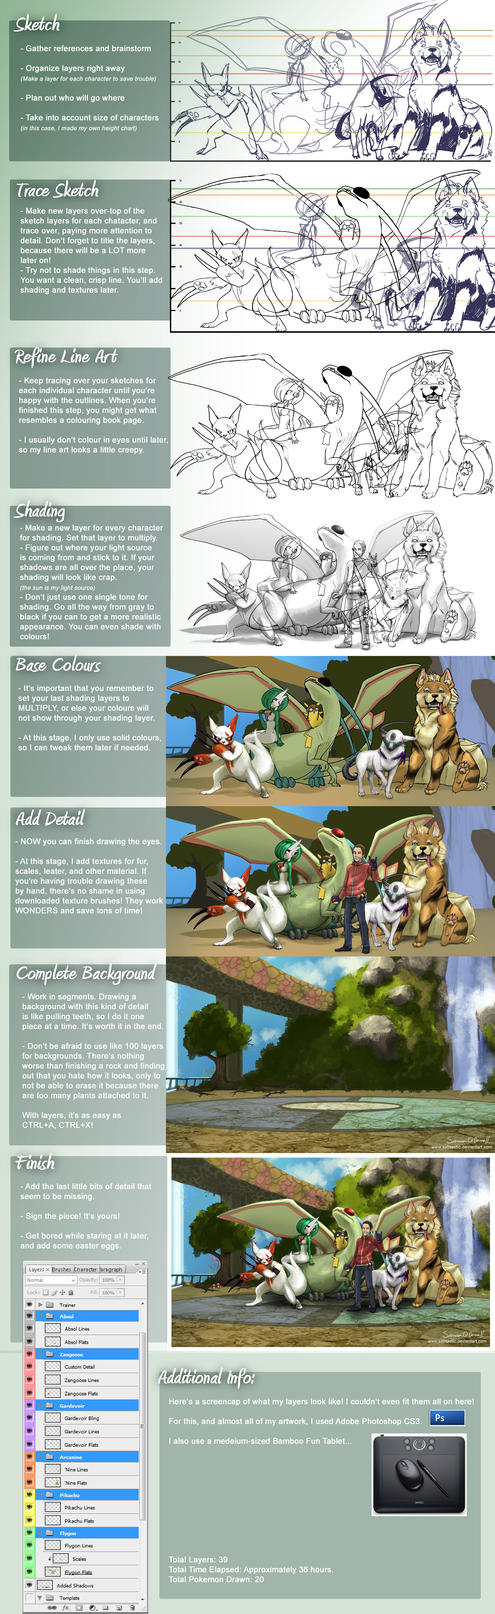 Pokemon Team - Step By Step by Sabtastic